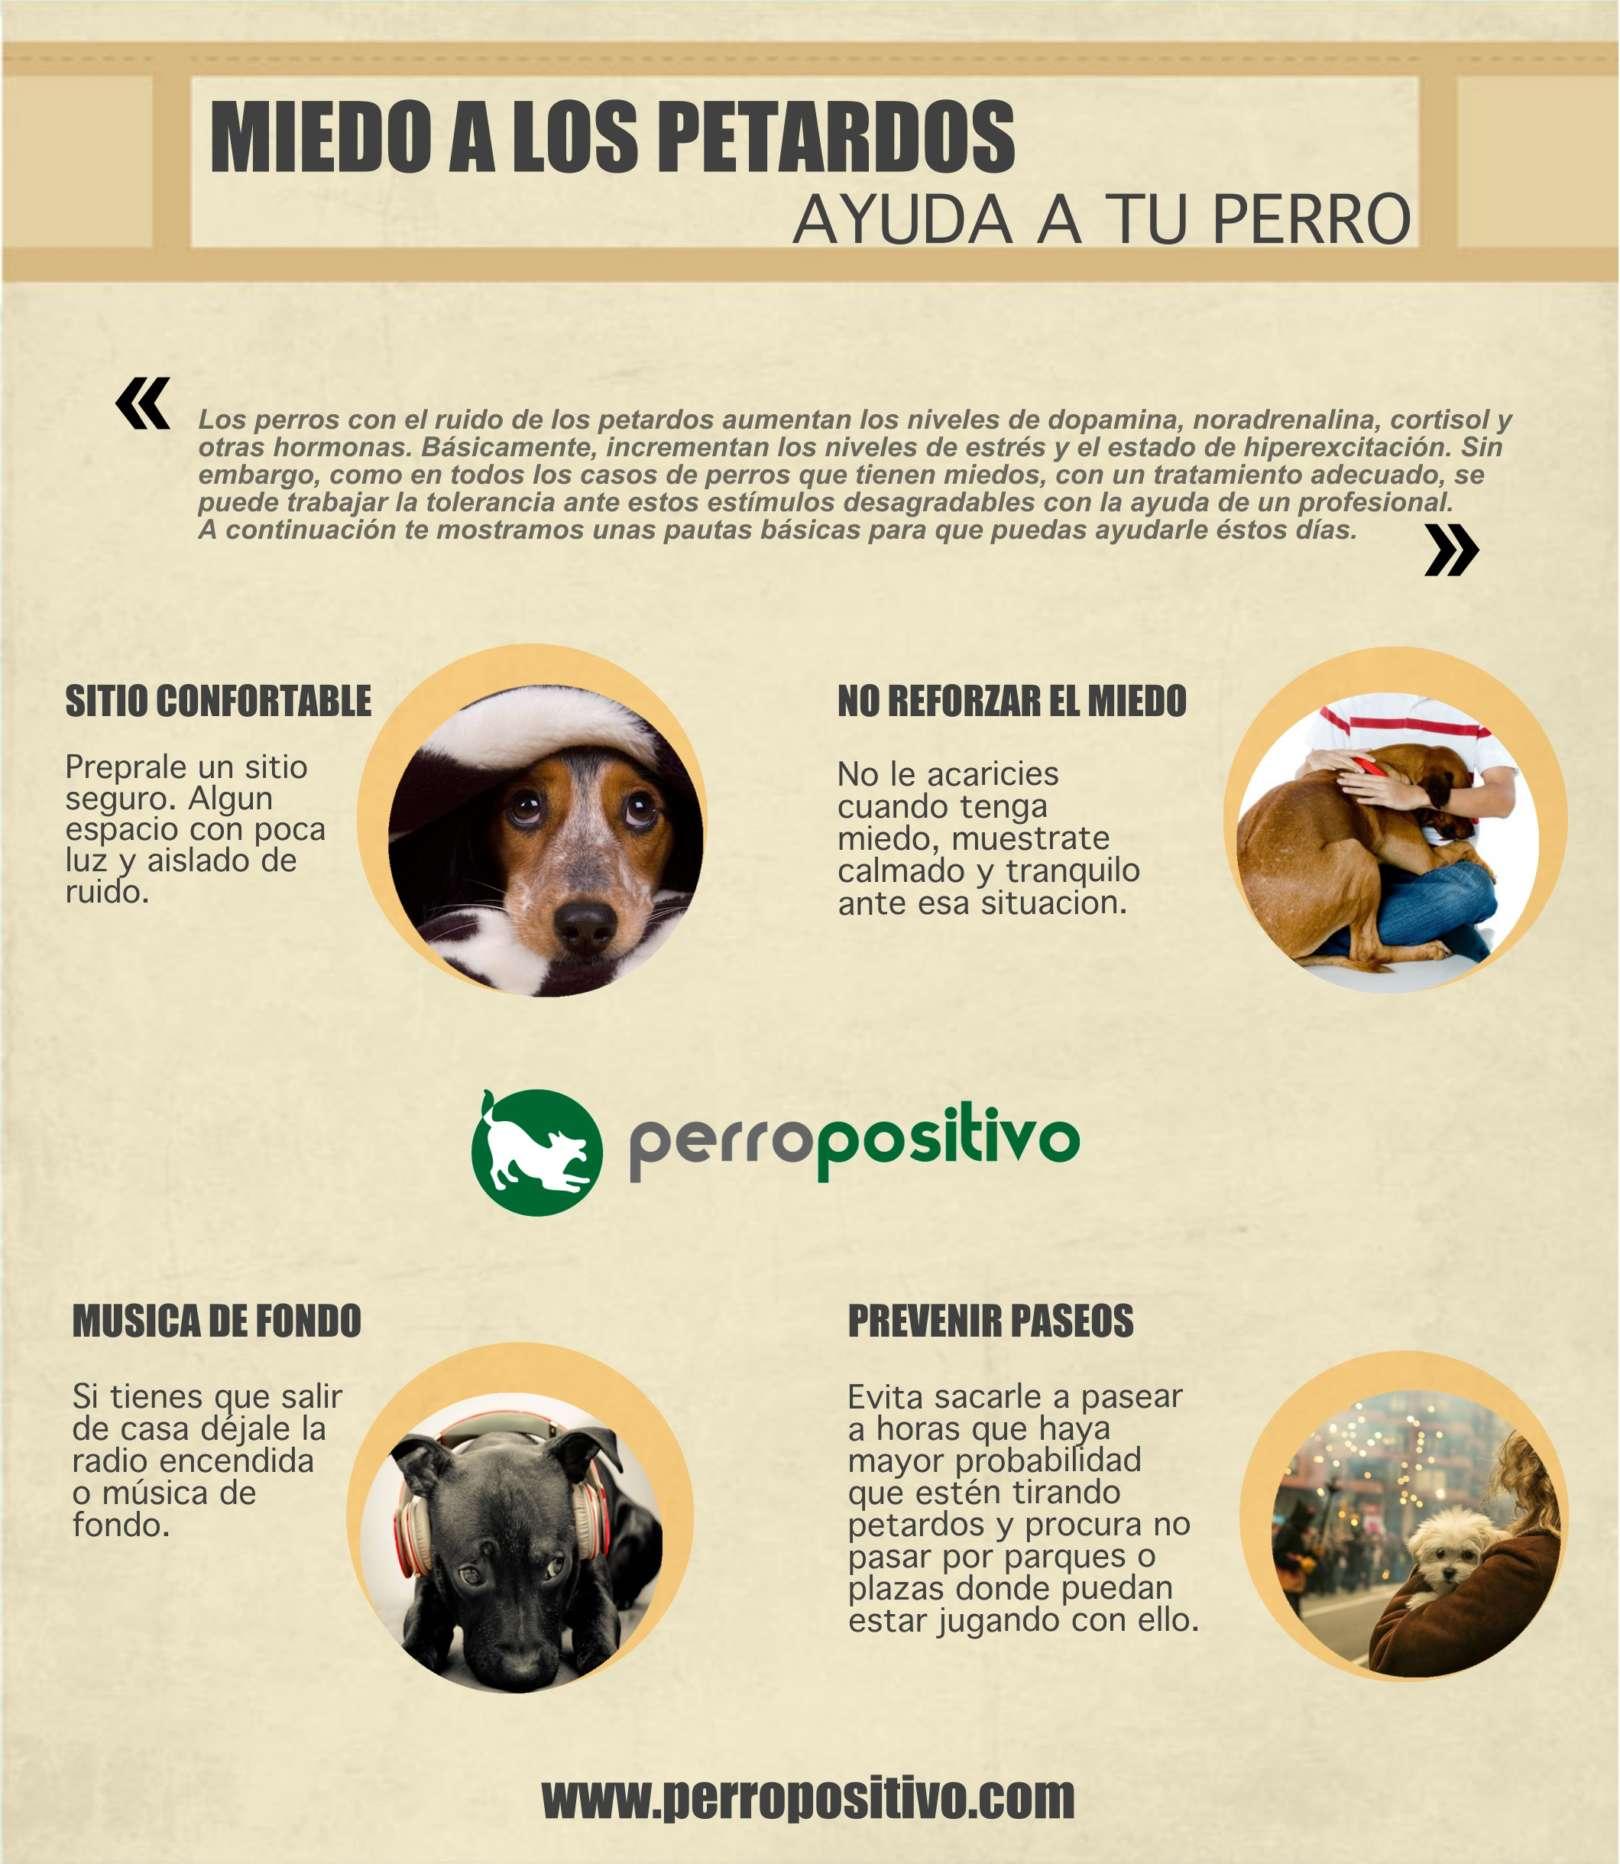 Pautas miedo petardos, como ayudar a tu perro - Perropositivo.com